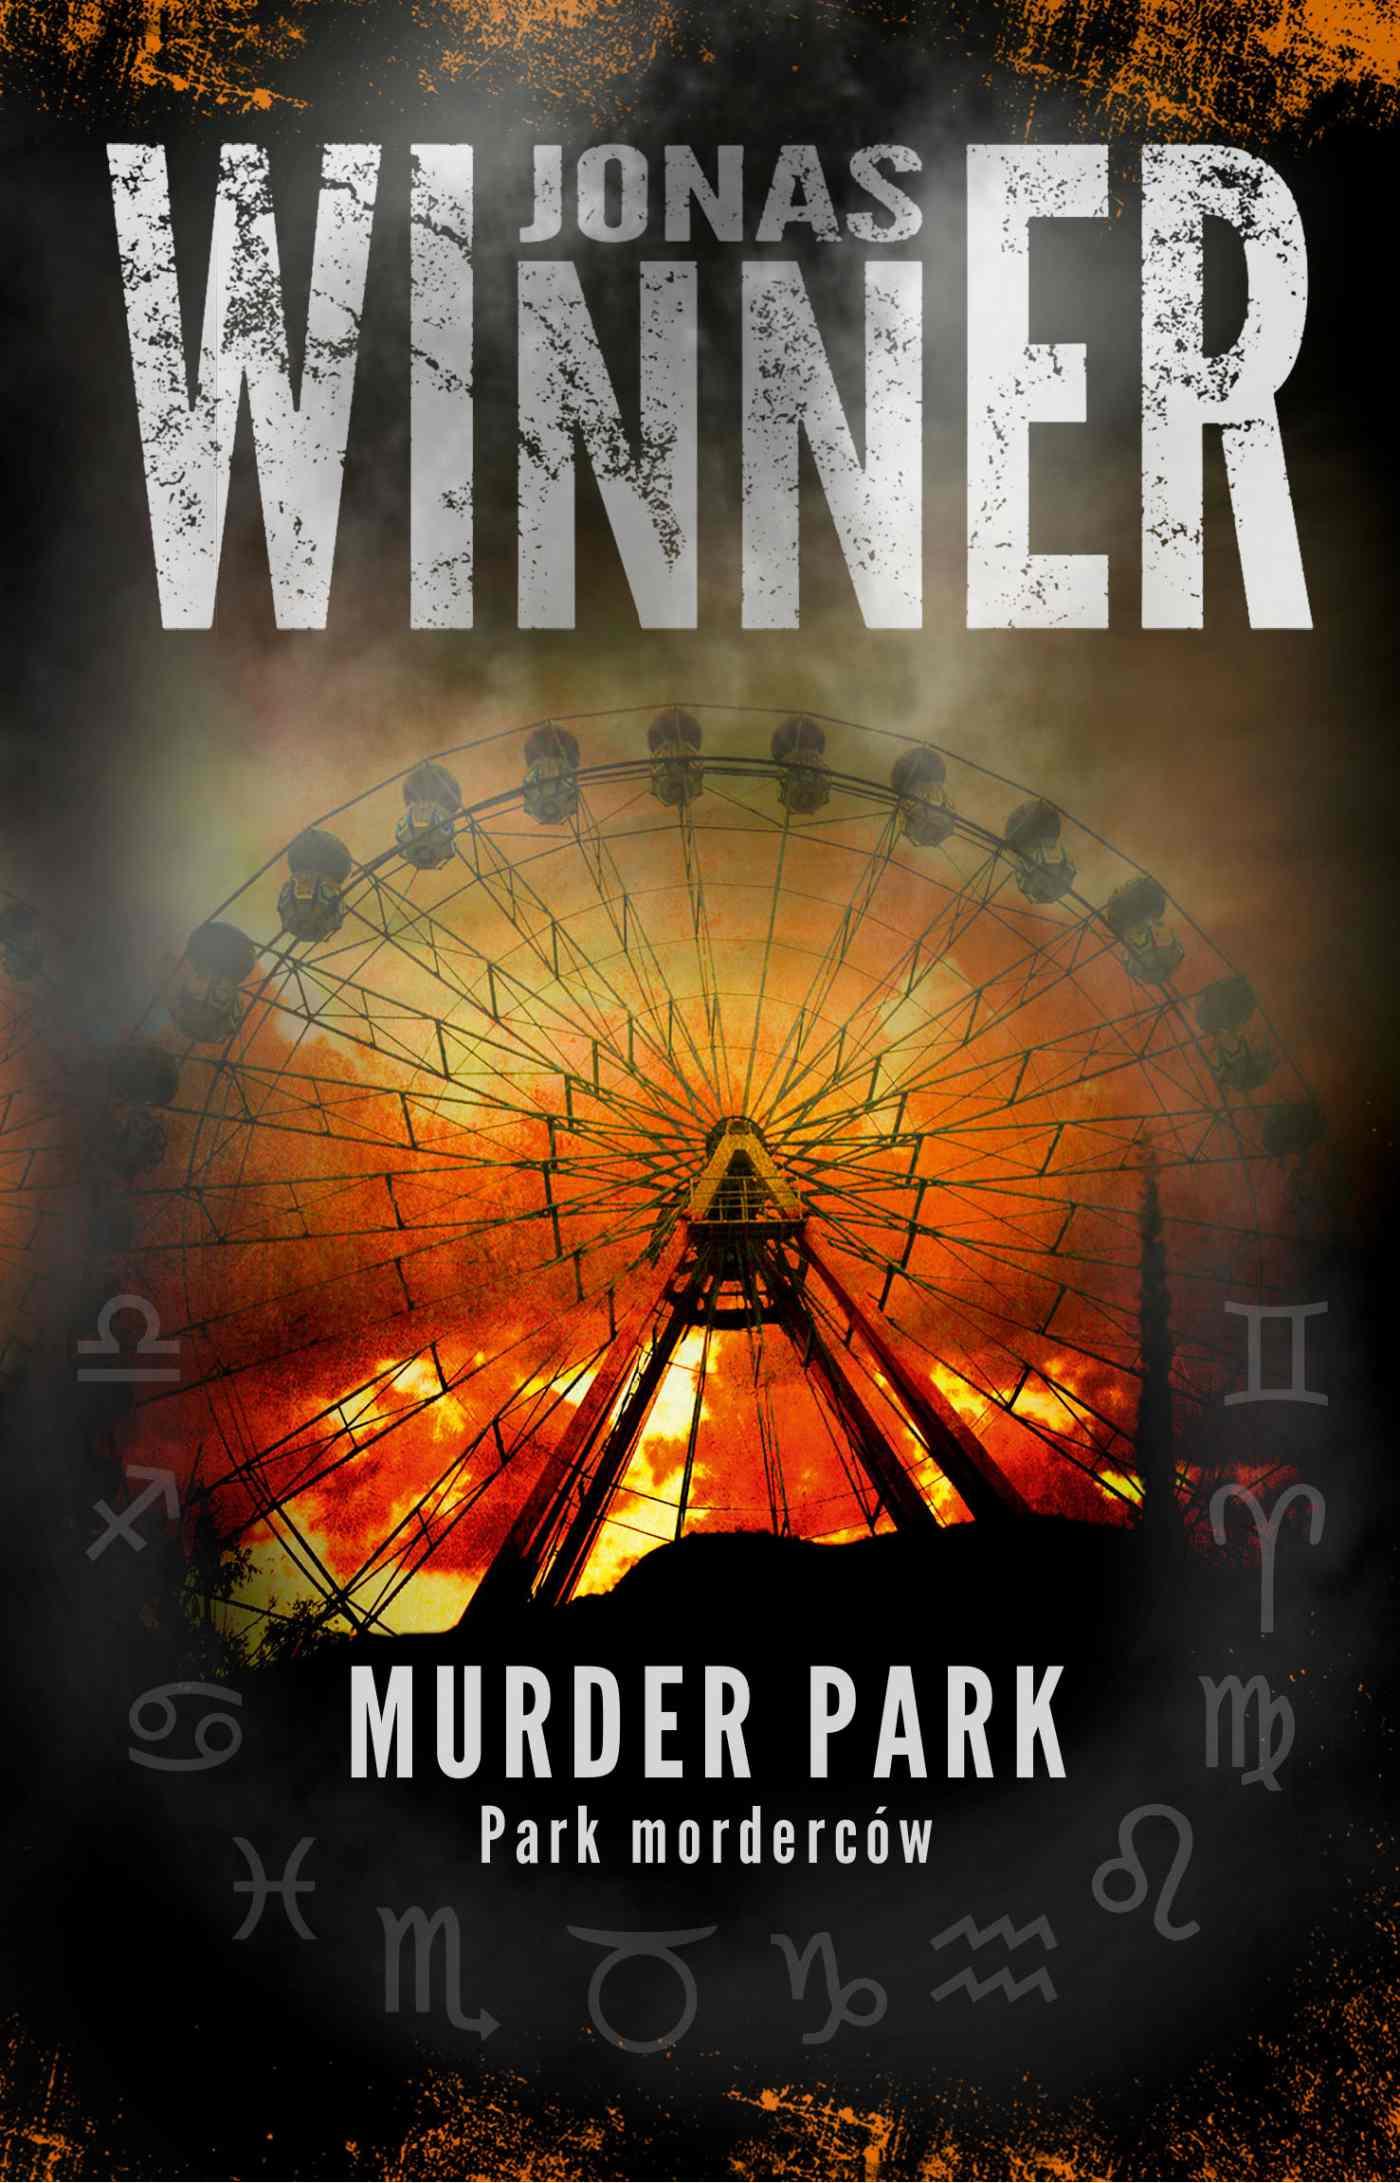 Murder park. Park morderców - Ebook (Książka na Kindle) do pobrania w formacie MOBI